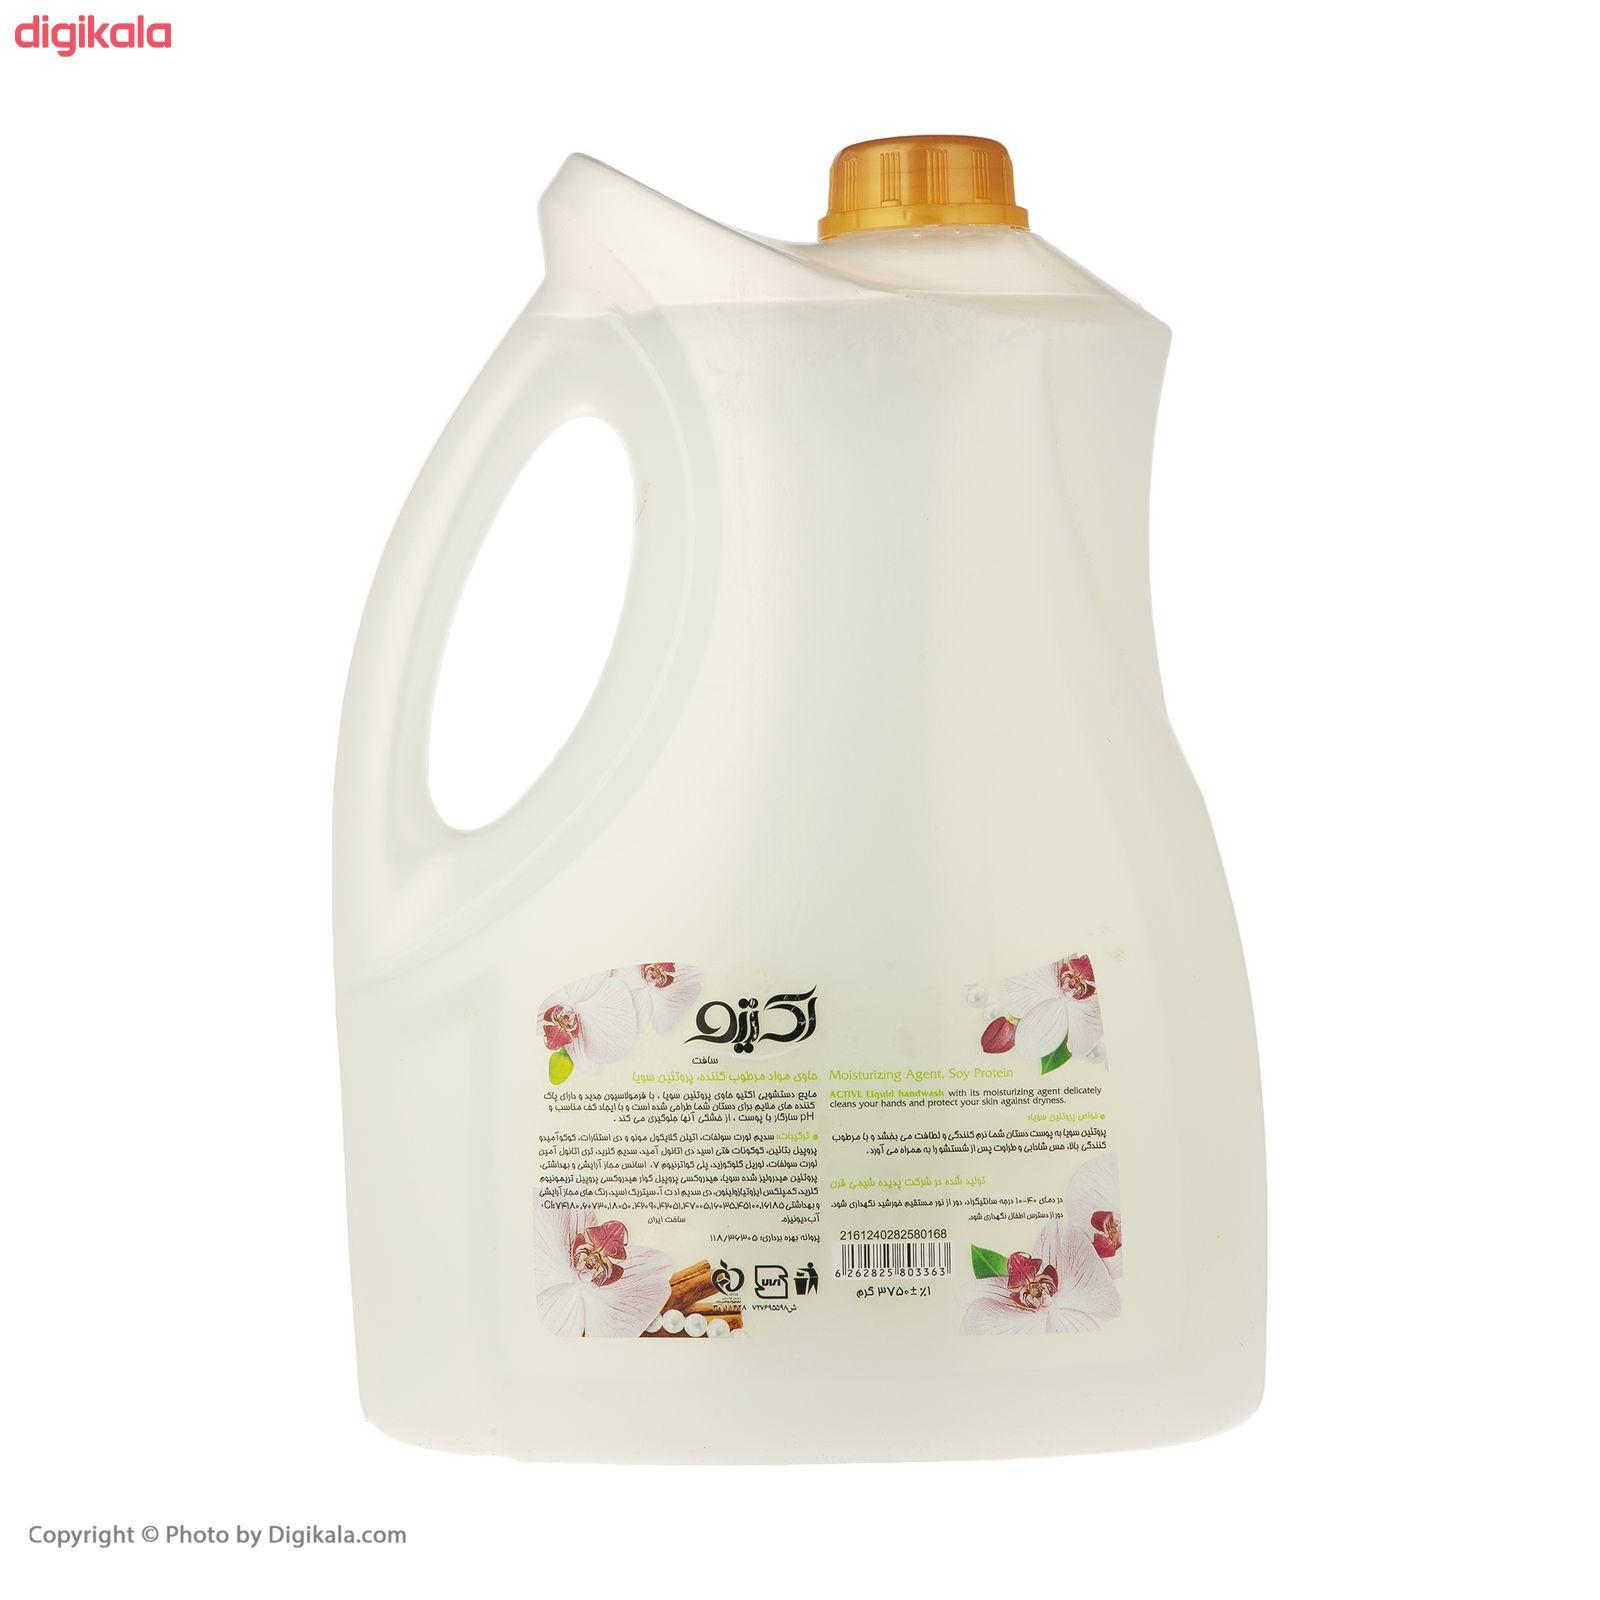 مایع دستشویی اکتیو مدل Orchid & Cinnamon مقدار 3.75 کیلوگرم main 1 1